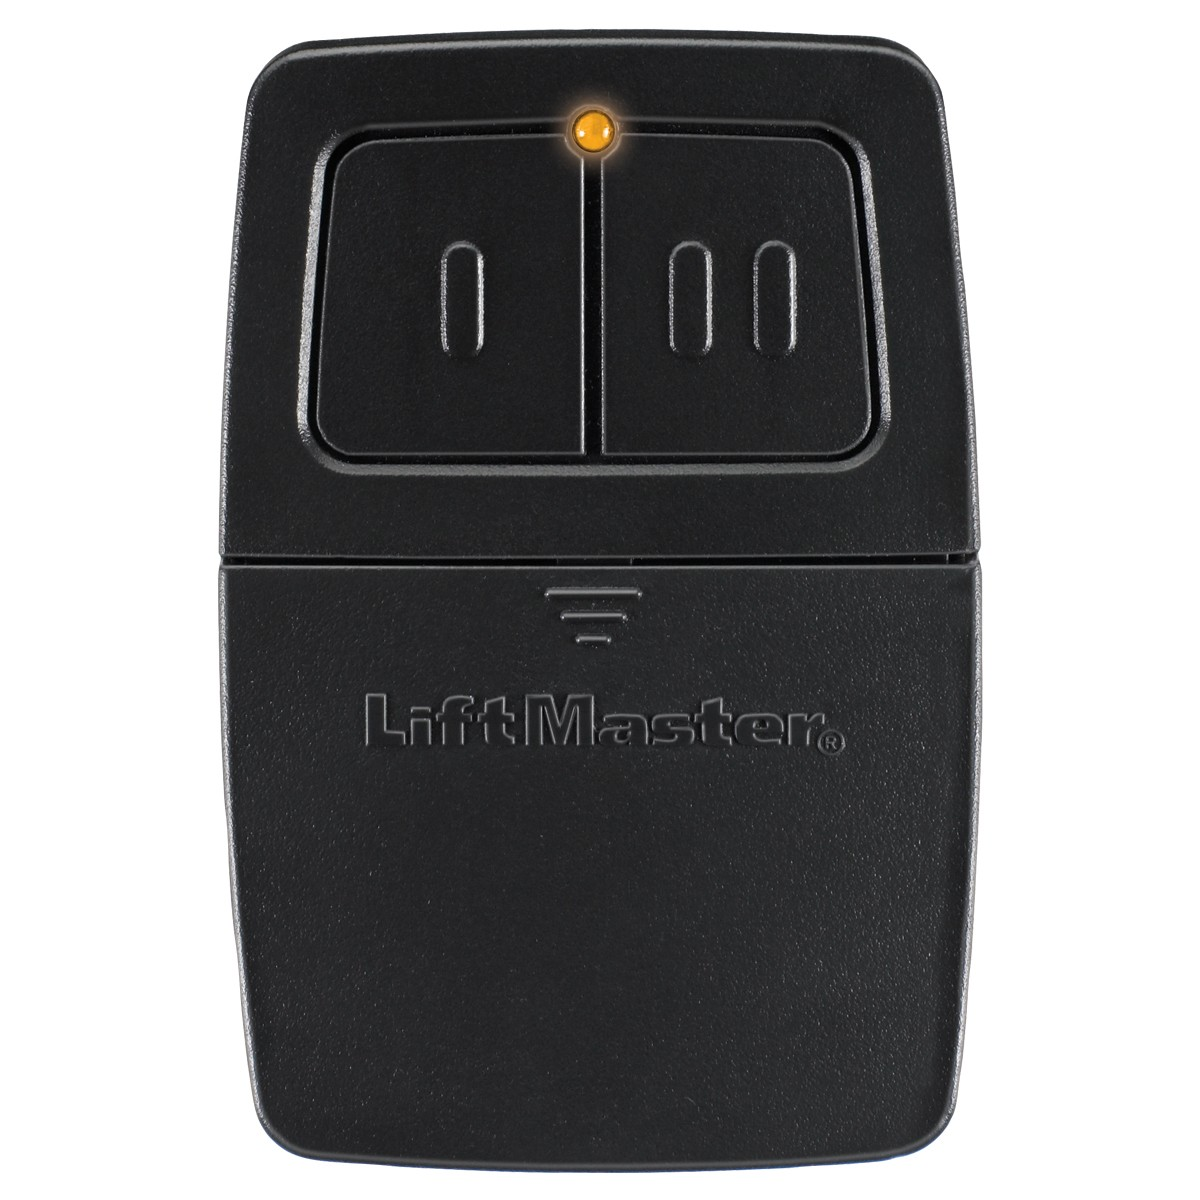 LiftMaster 375LM Universal Gate or Garage Door Opener Remote Control | AAARemotes